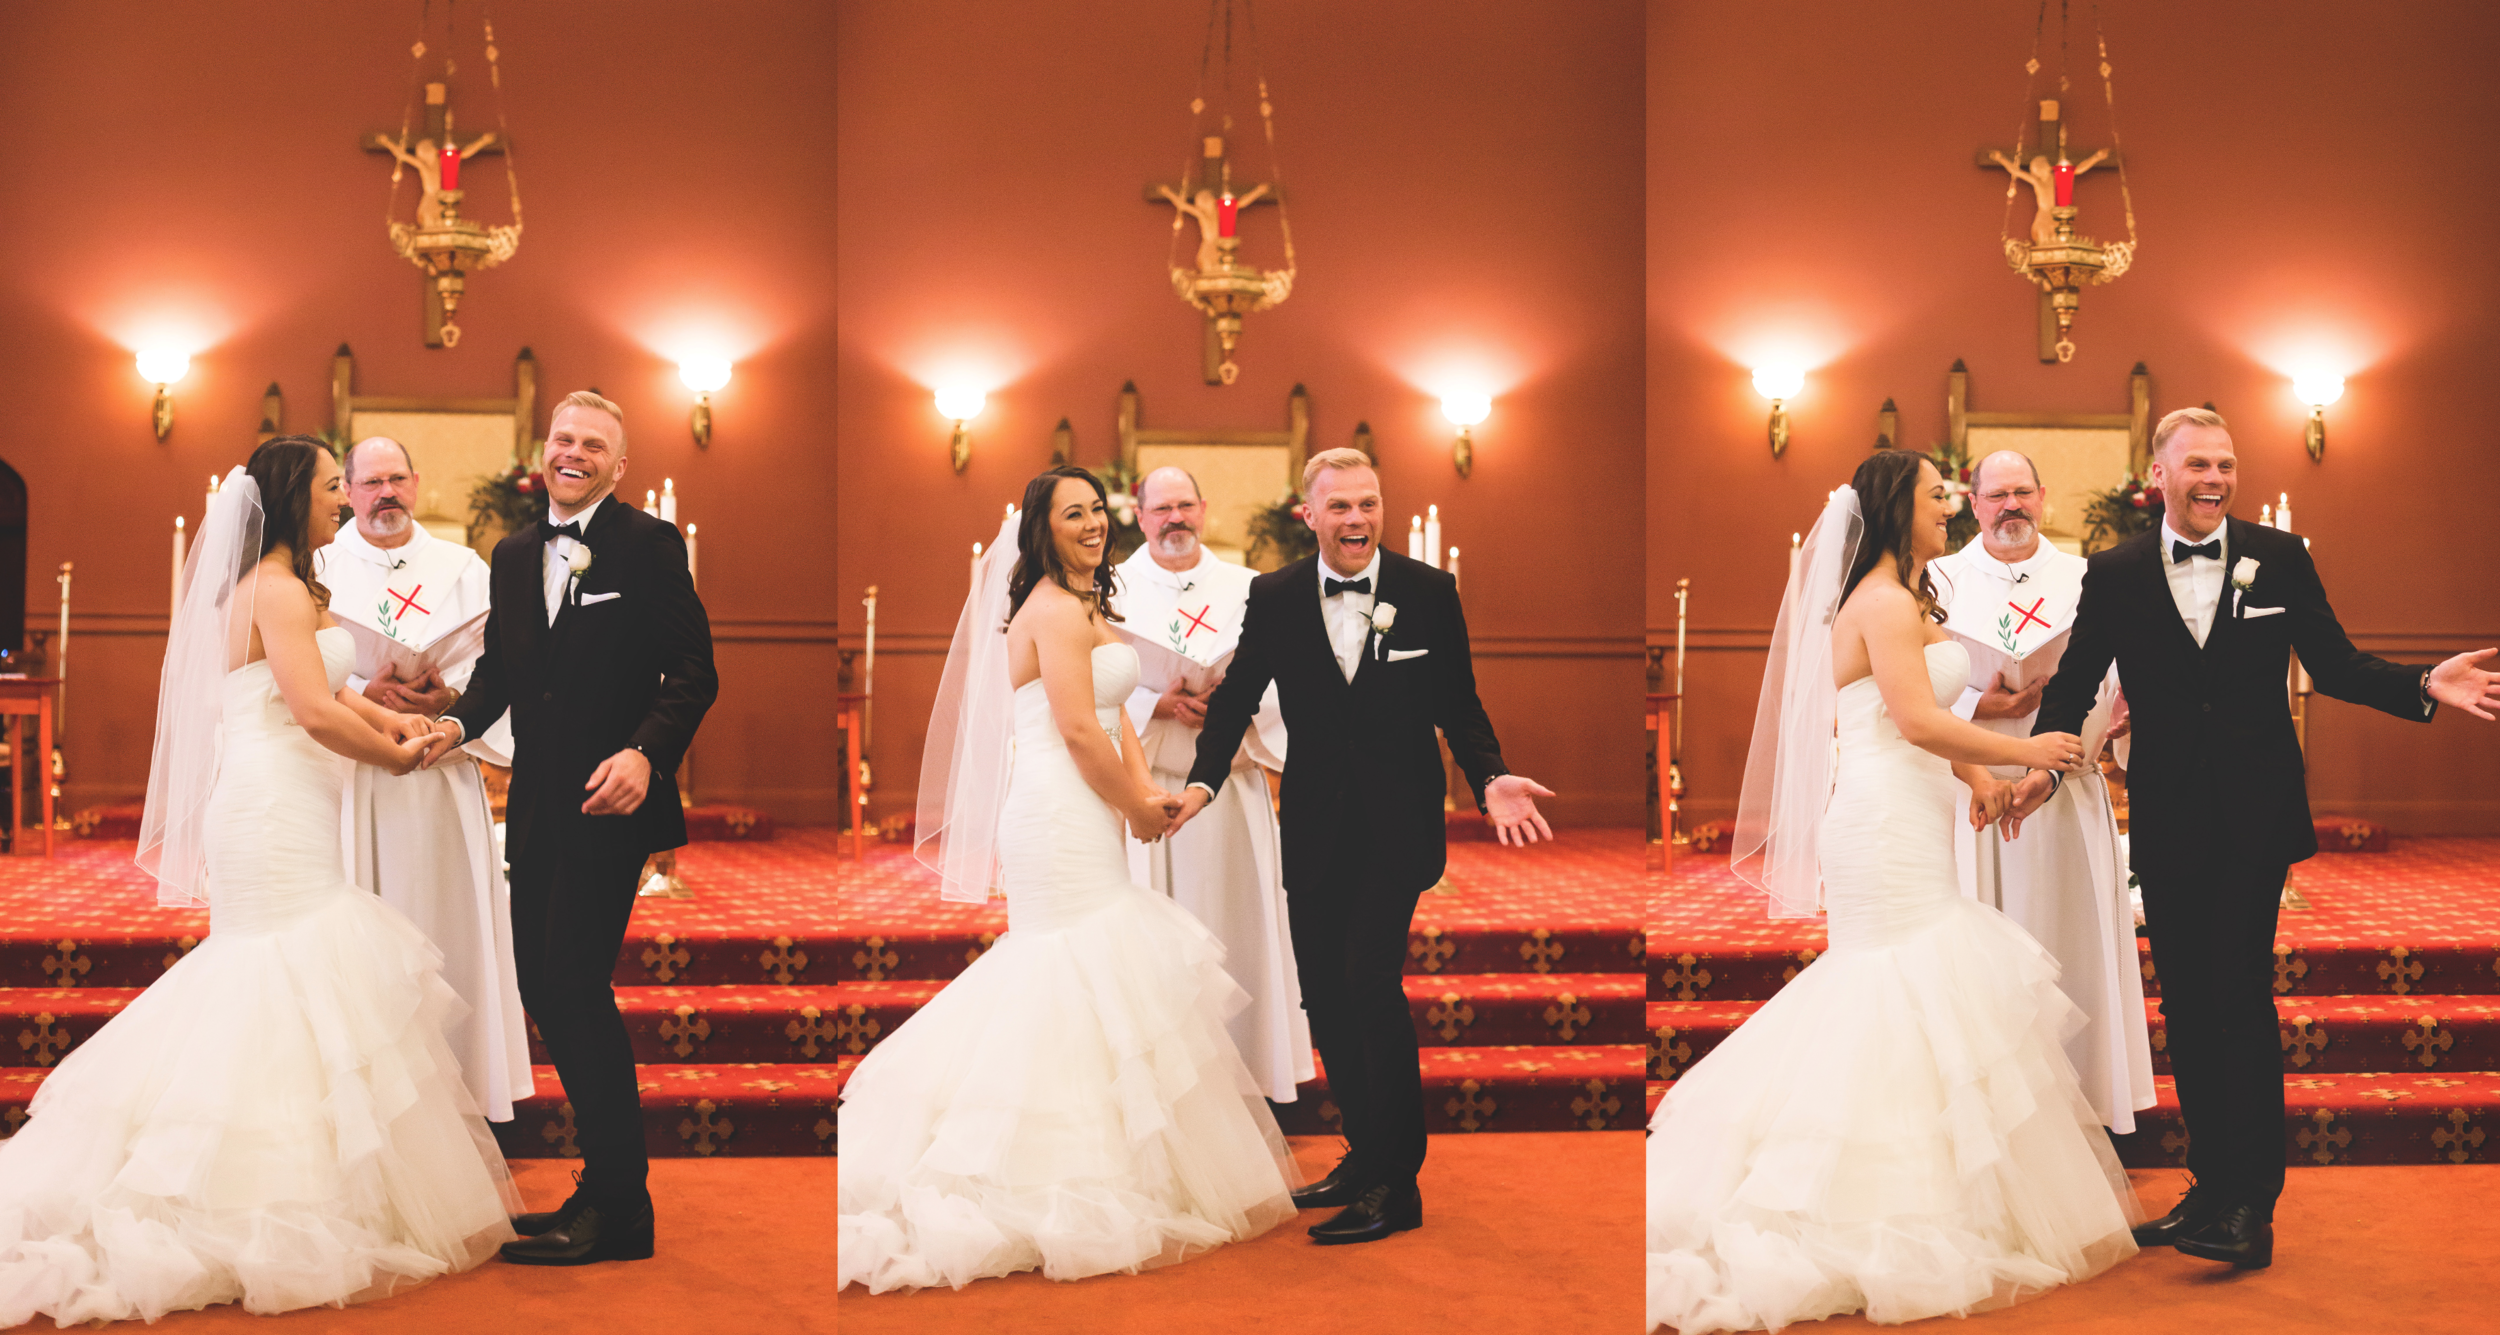 Wedding-Harbour-Banquet-Center-Oakville-Photographer-Wedding-Hamilton-Saint-James-Espresso-Downtown-HamOnt-GTA-Niagara-Toronto-Moments-by-Lauren-Photography-Photo-Image-15.png